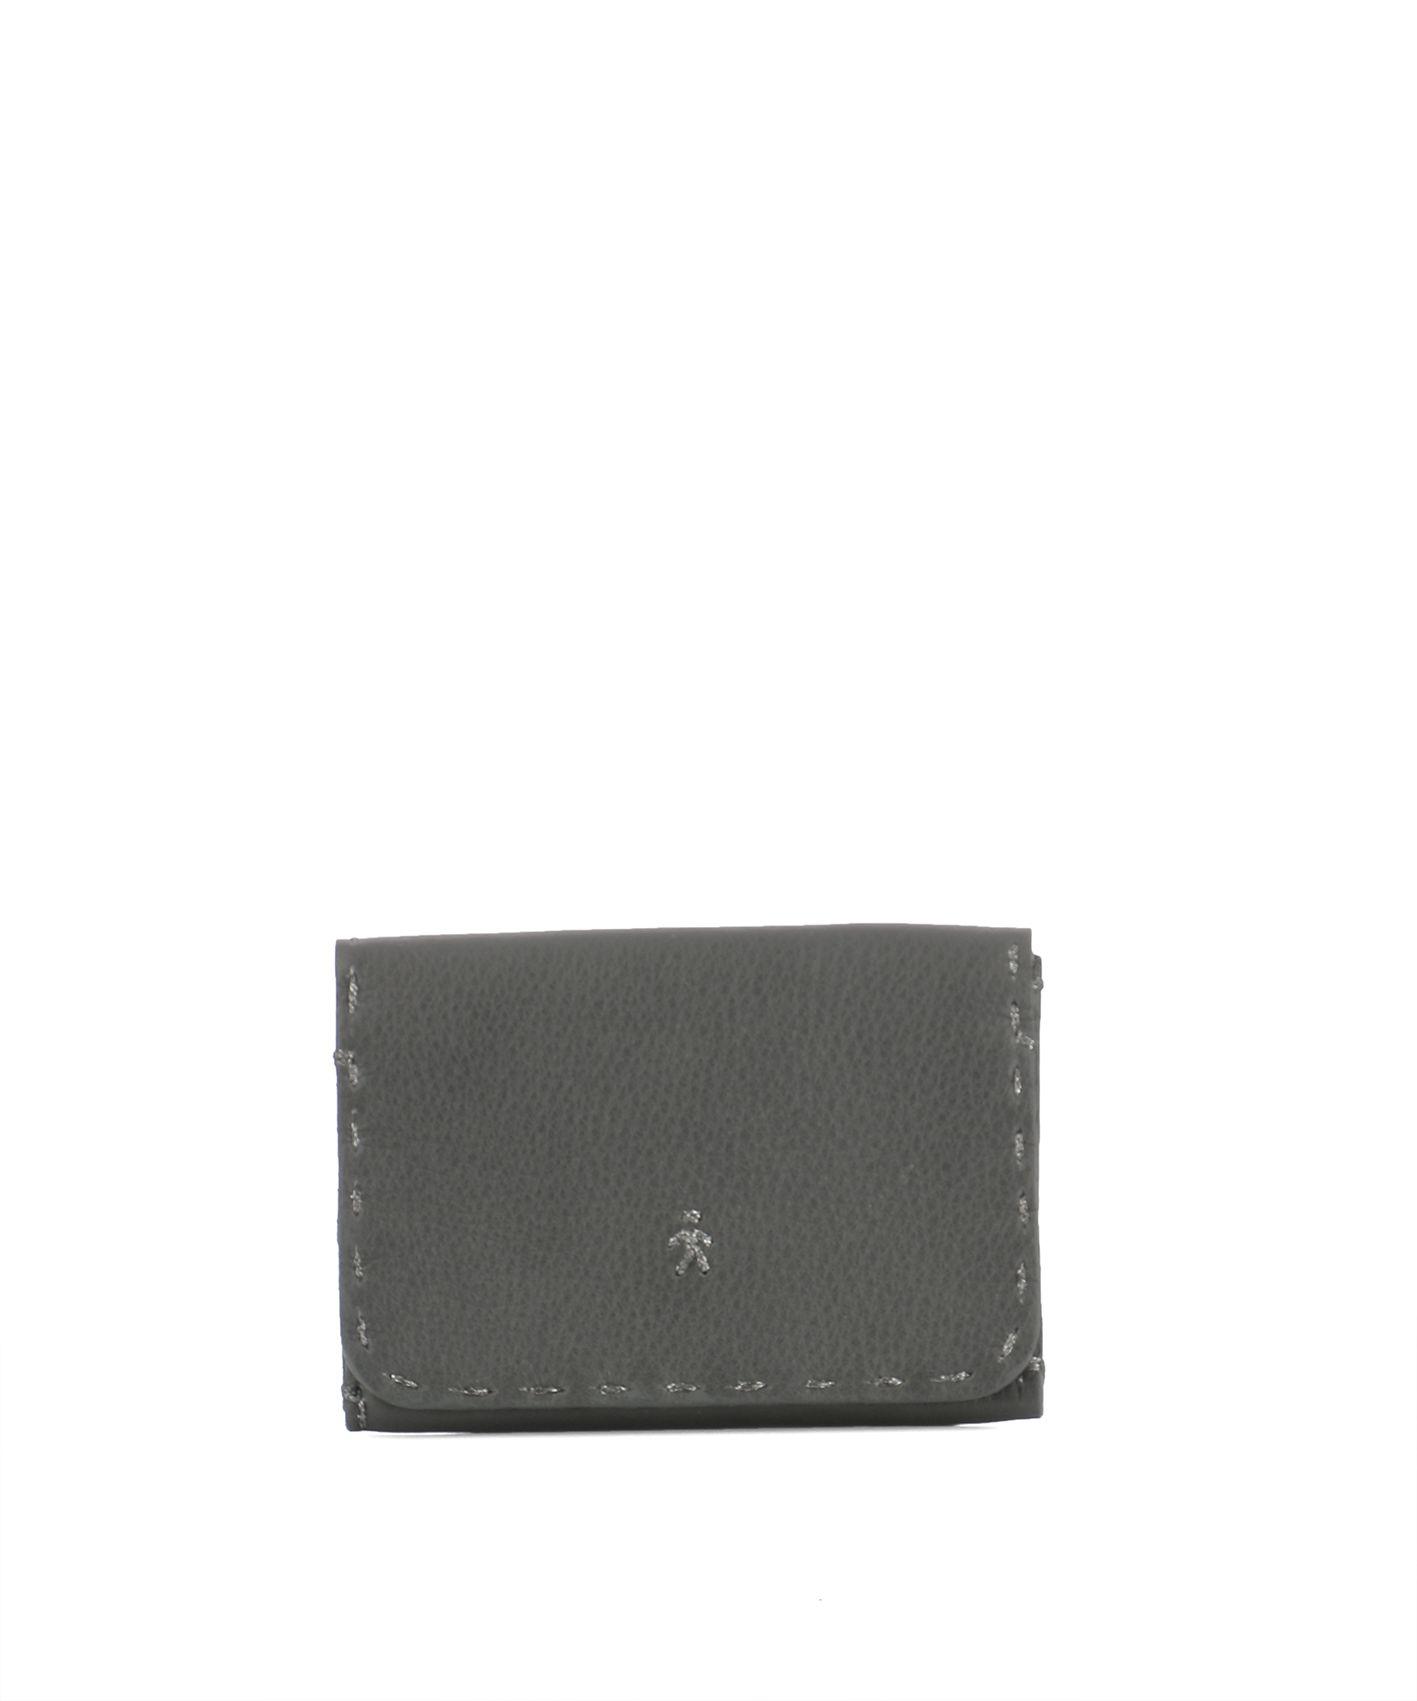 Grey Leather Card Holder